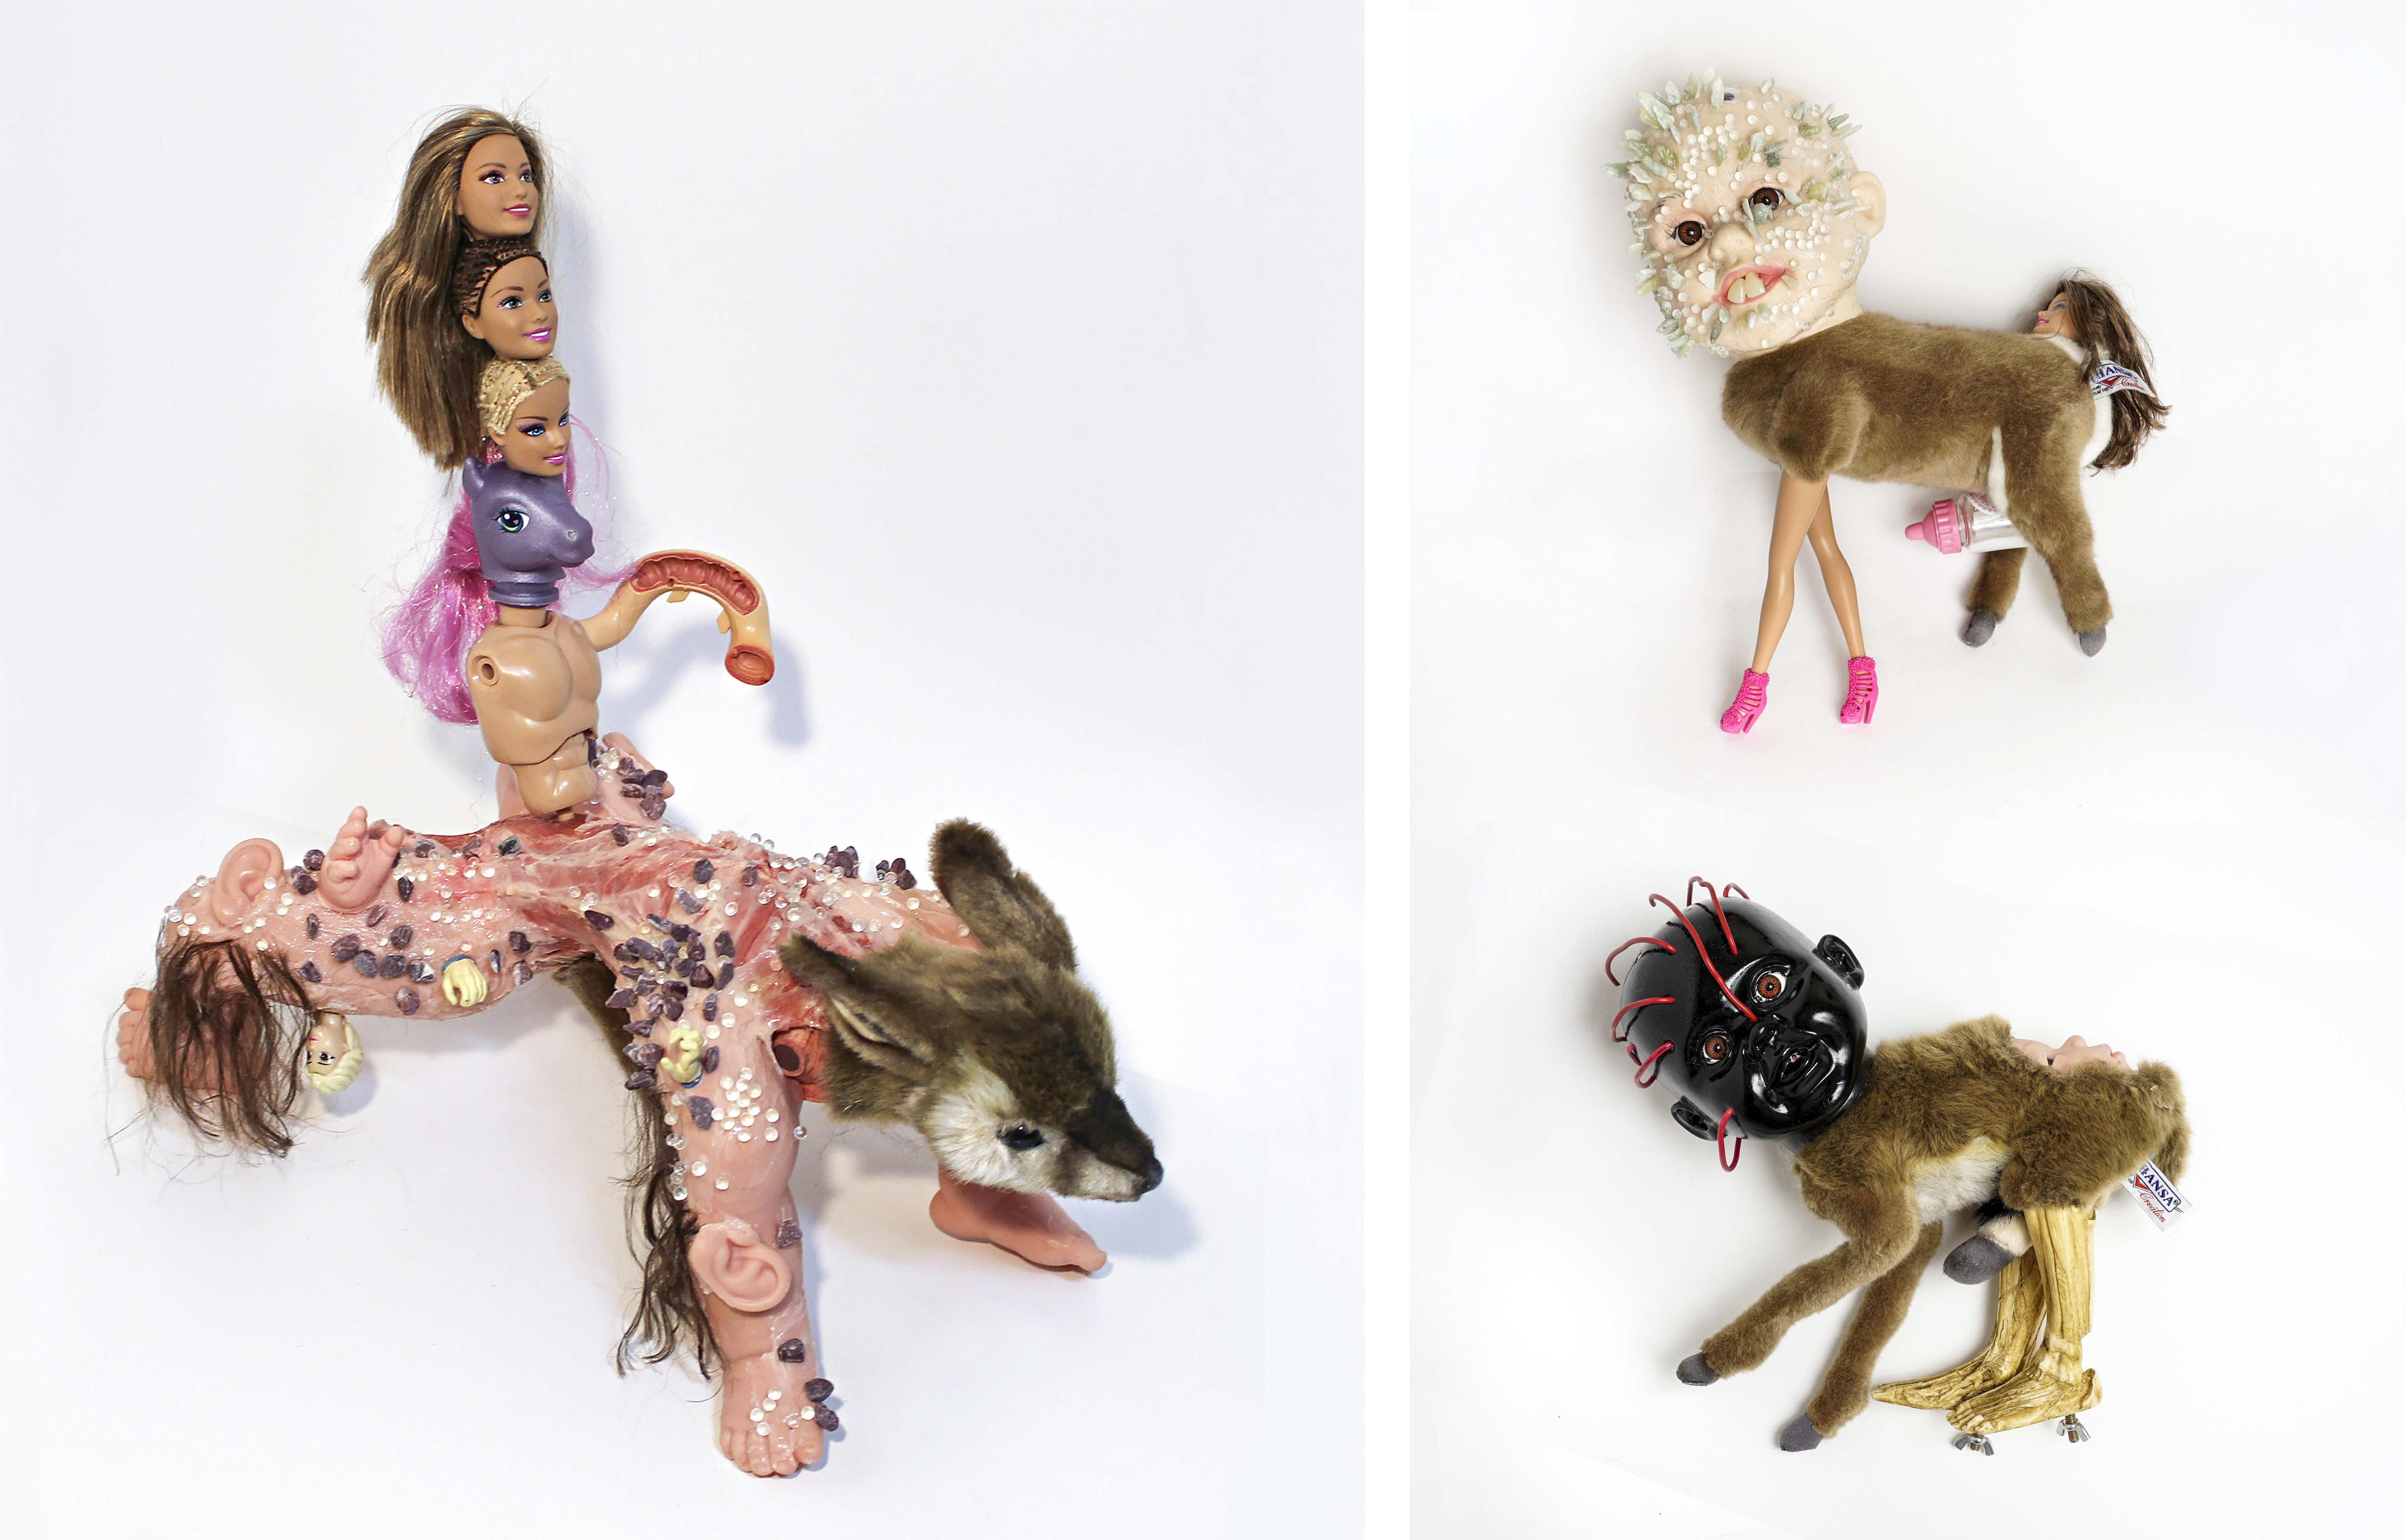 8 Anagram 9, Anagram 3,4, doll, anatomy model, glass bead, gravel, silicone, hair, mixed media, 30x40x30(cm), 2016